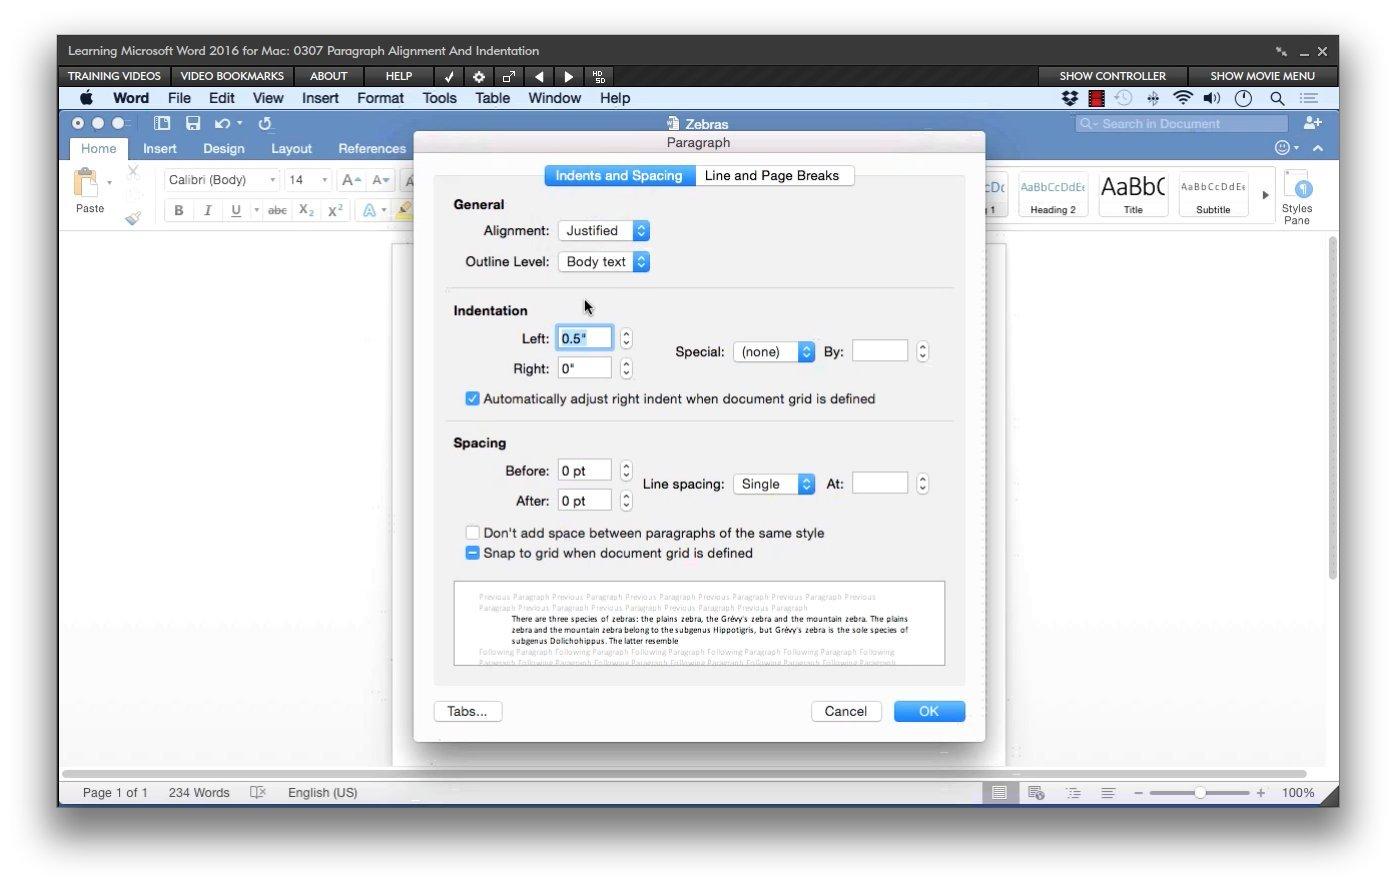 Excel 2016 For Mac Snap To Grid - runfasr